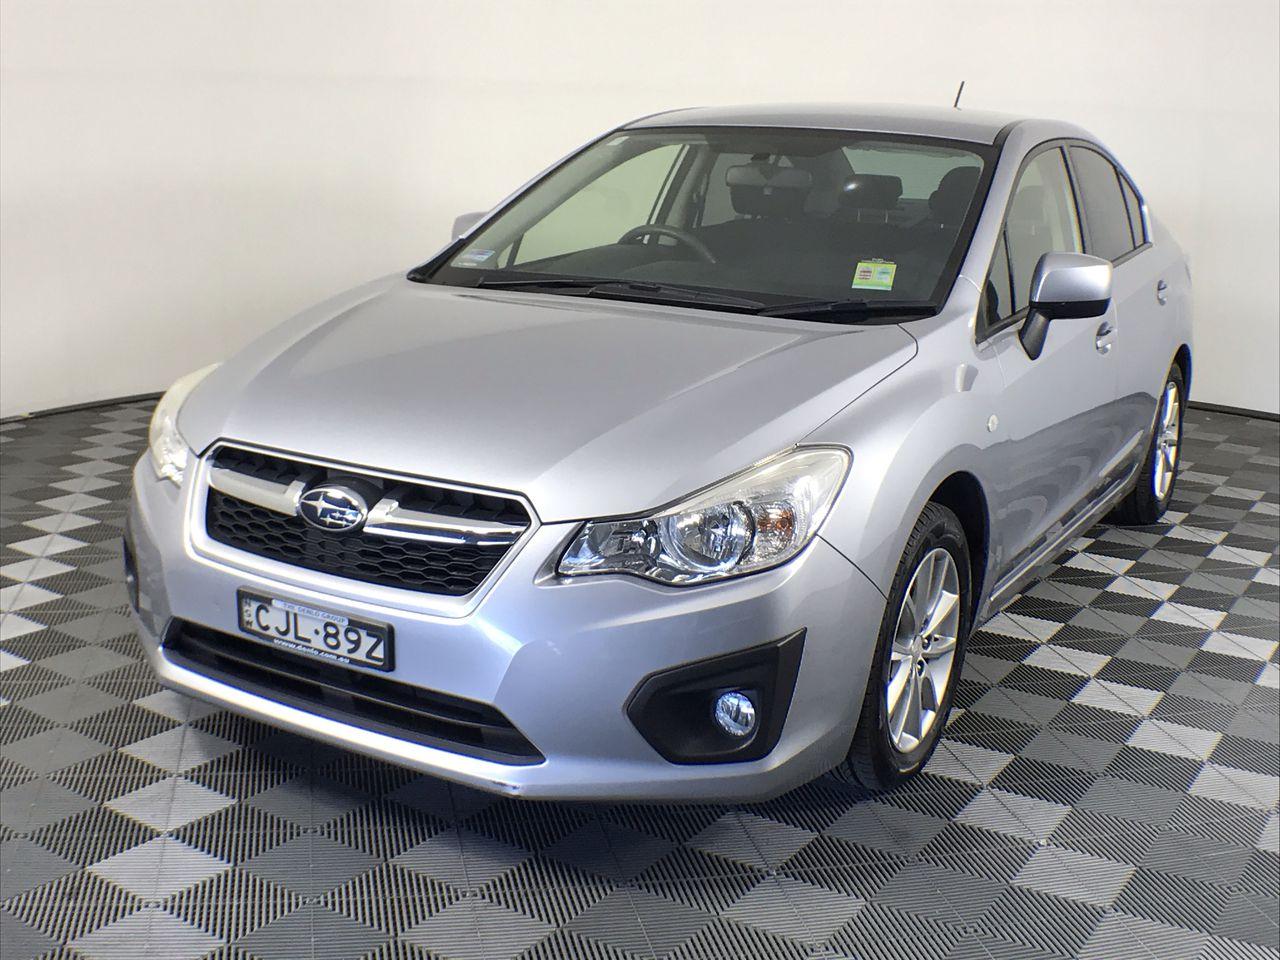 2012 Subaru Impreza 2.0i-L (AWD) G4 CVT Sedan